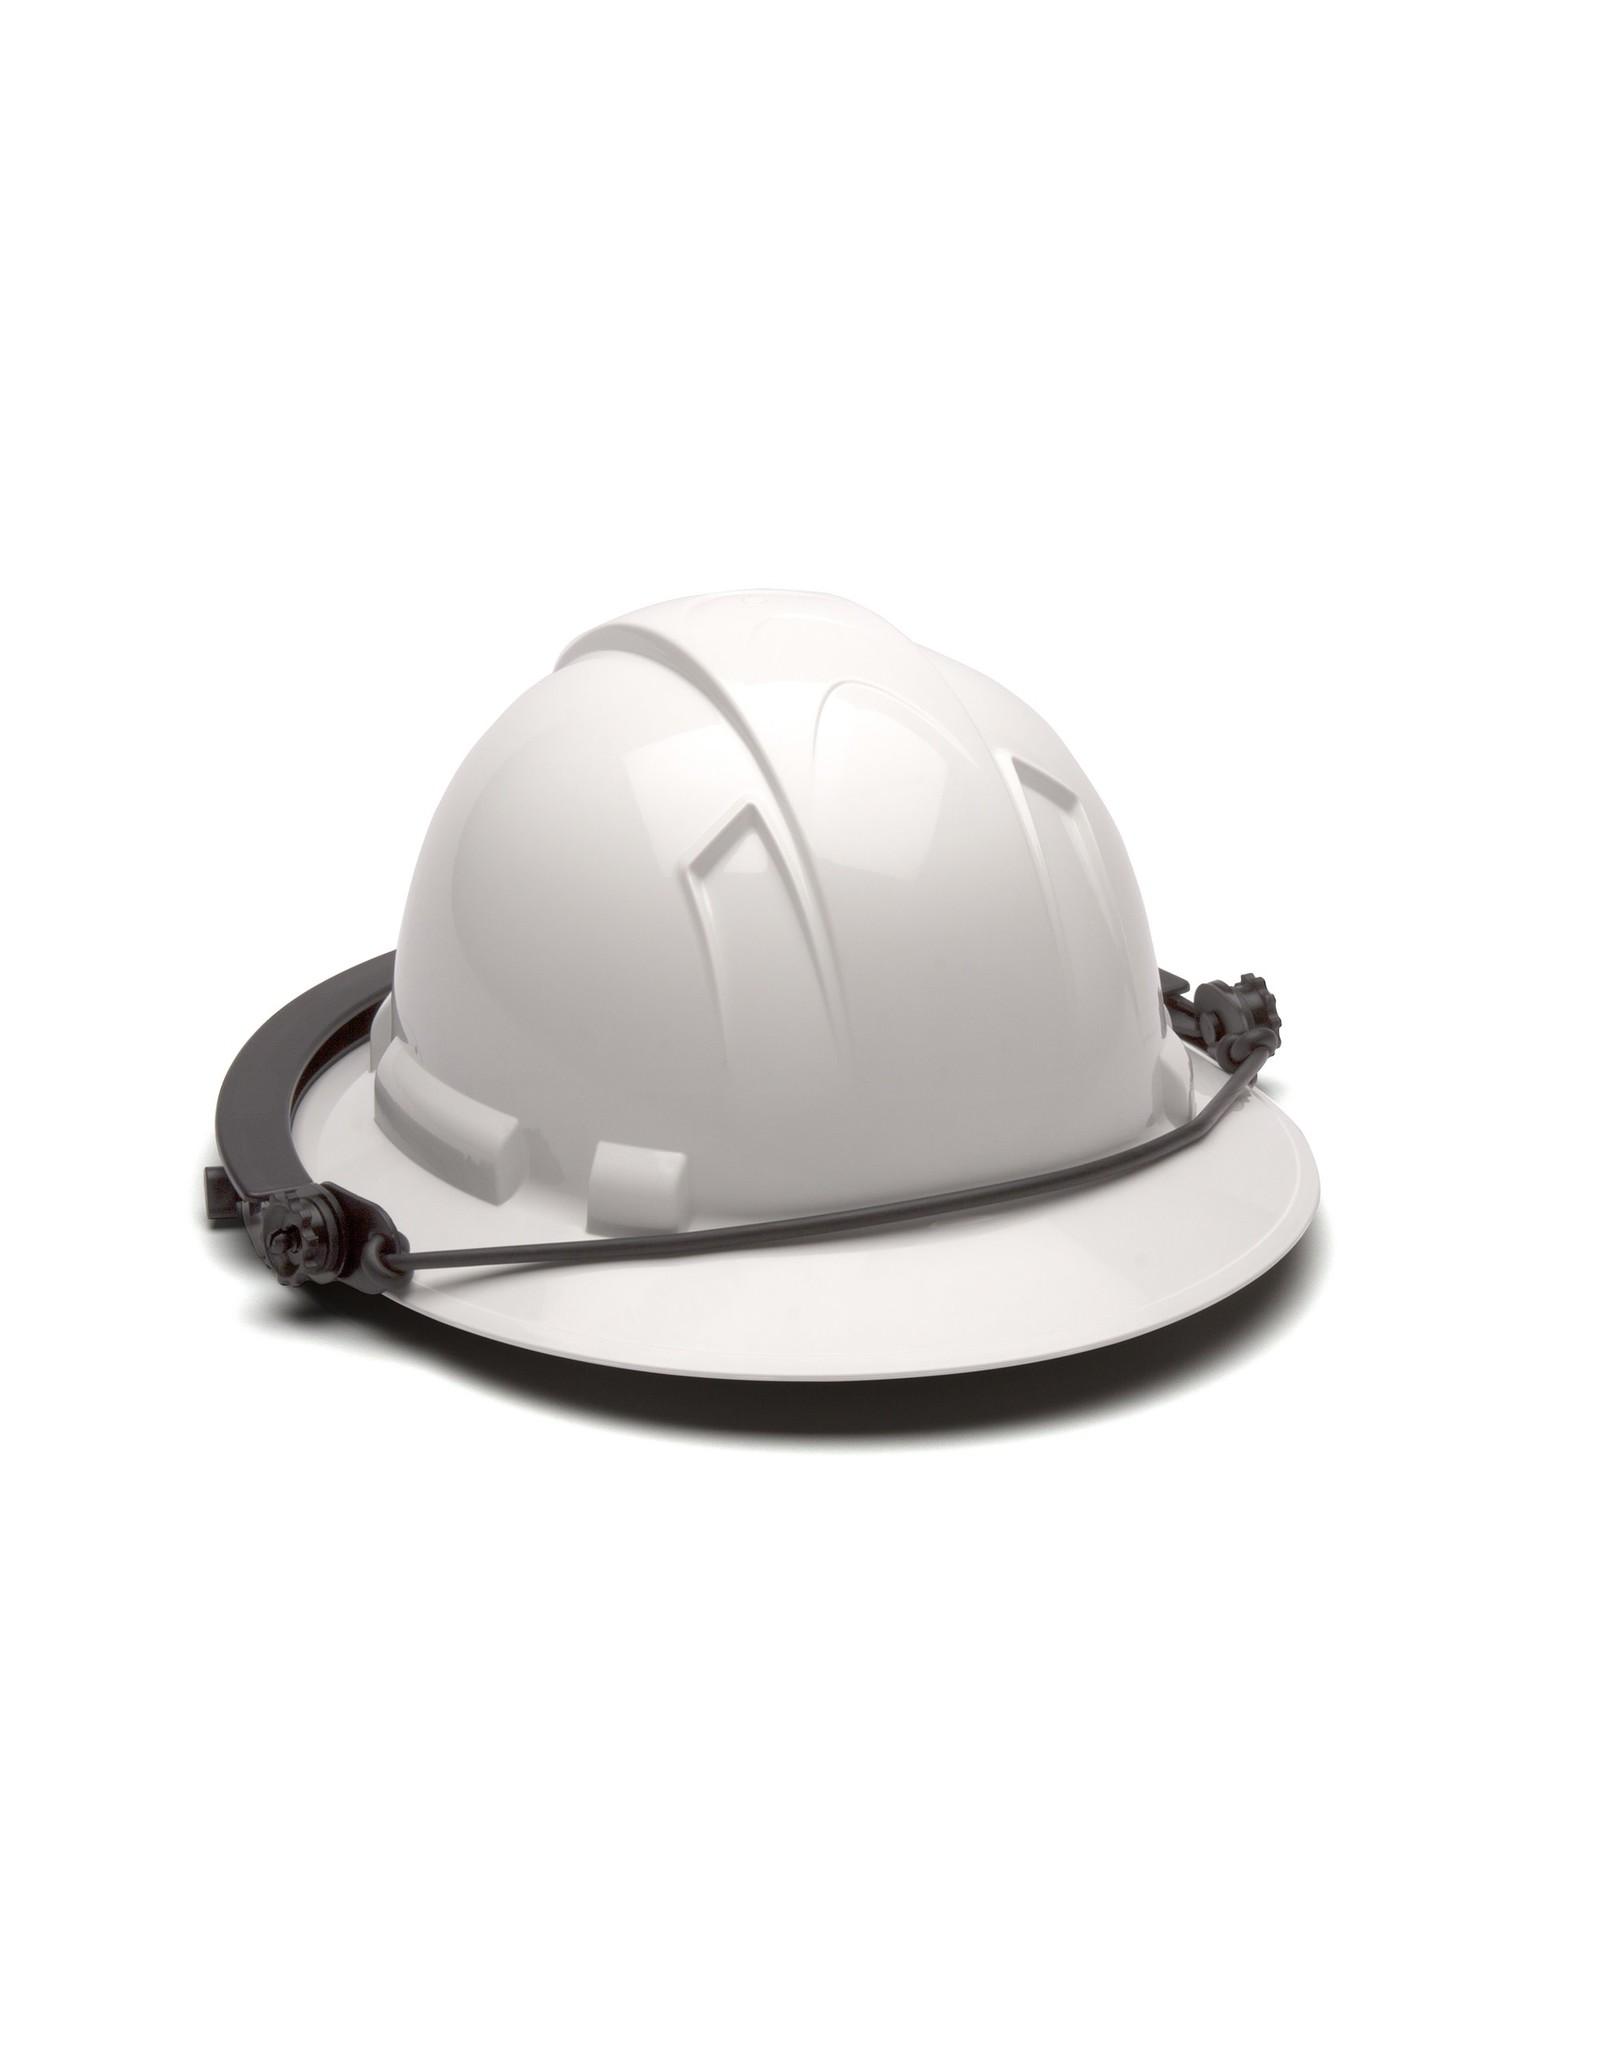 Pyramex Pyramex Dielectric Full Brim Adapter for Hard Hats